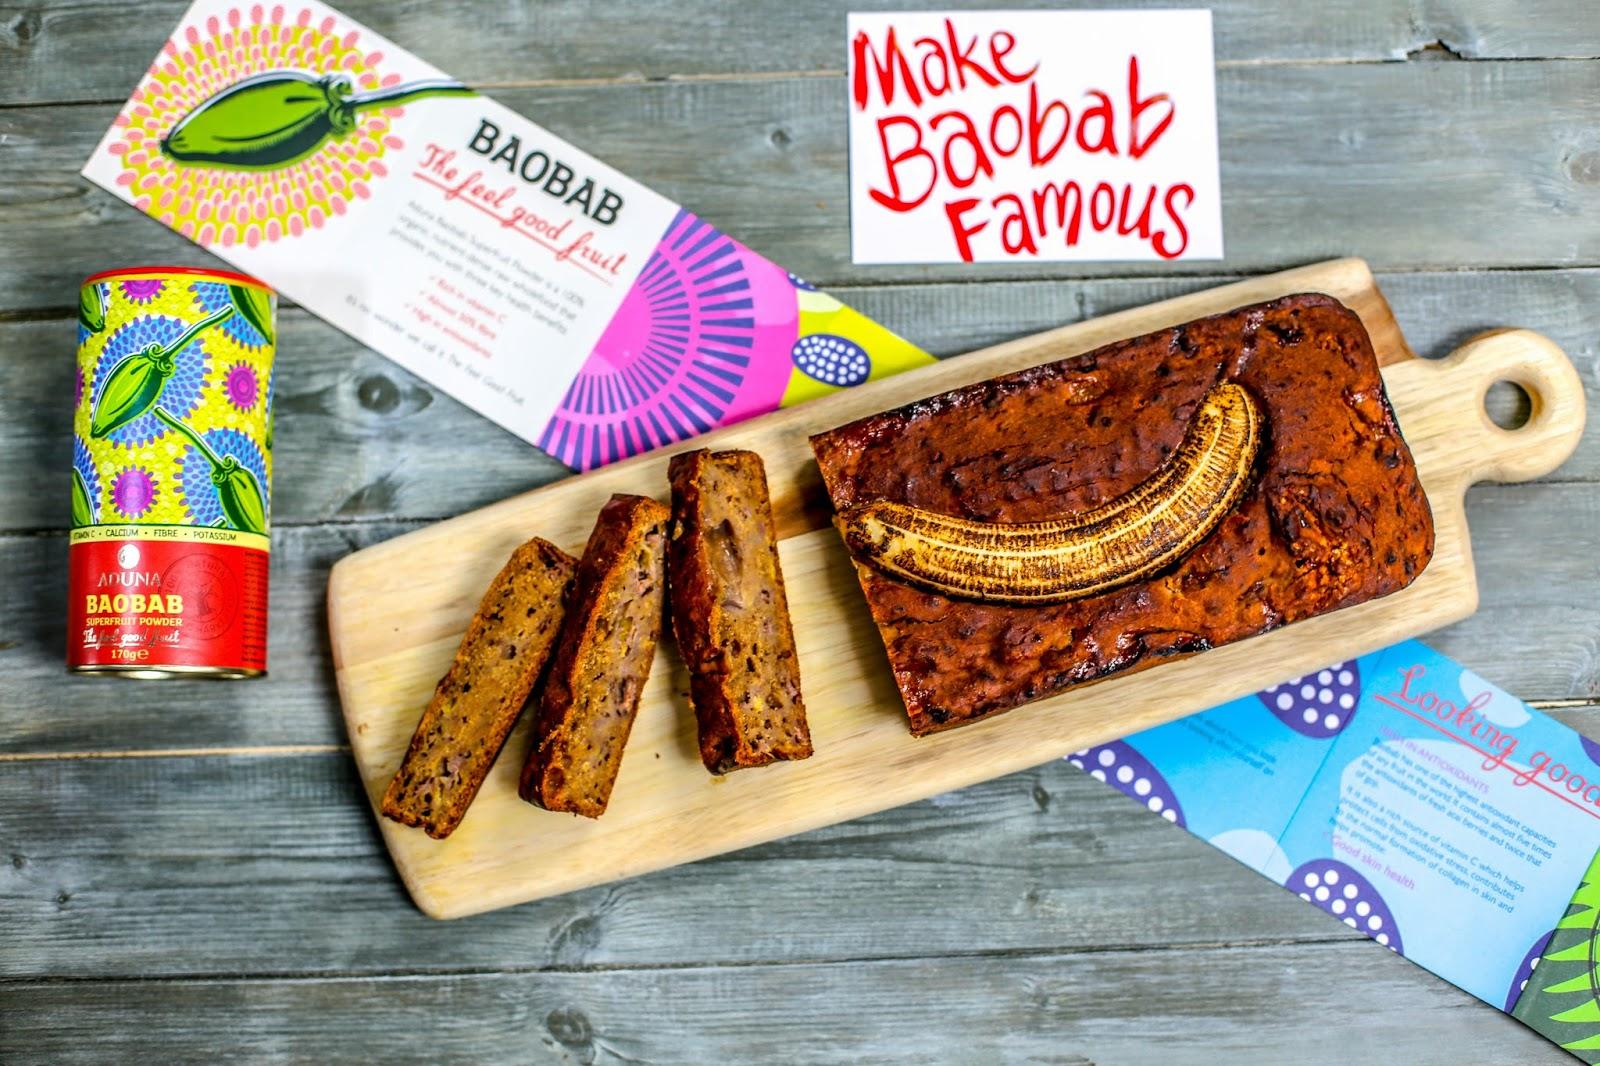 Gluten free banana bread with baobab love